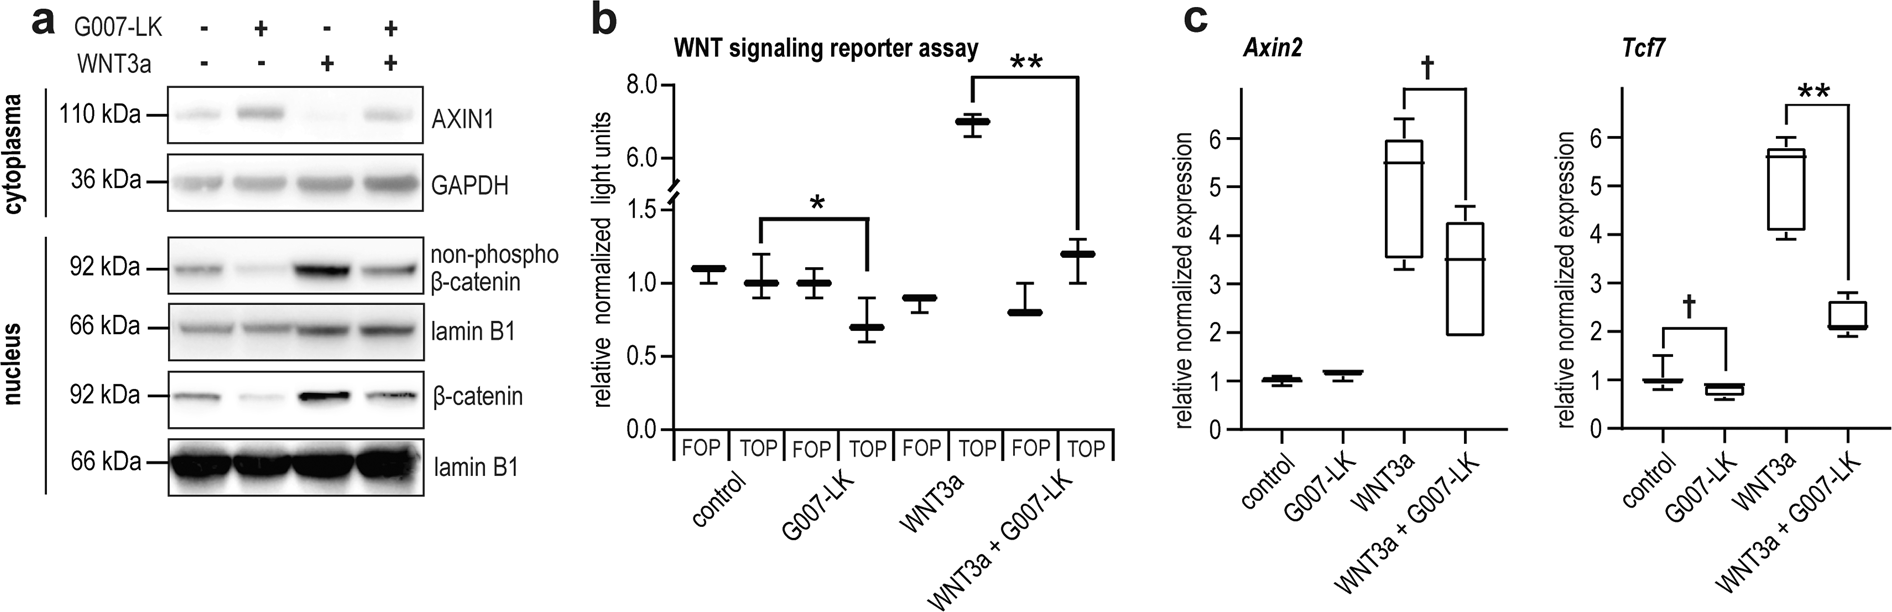 Tankyrase Inhibition Sensitizes Melanoma To Pd 1 Immune Checkpoint Blockade In Syngeneic Mouse Models Communications Biology